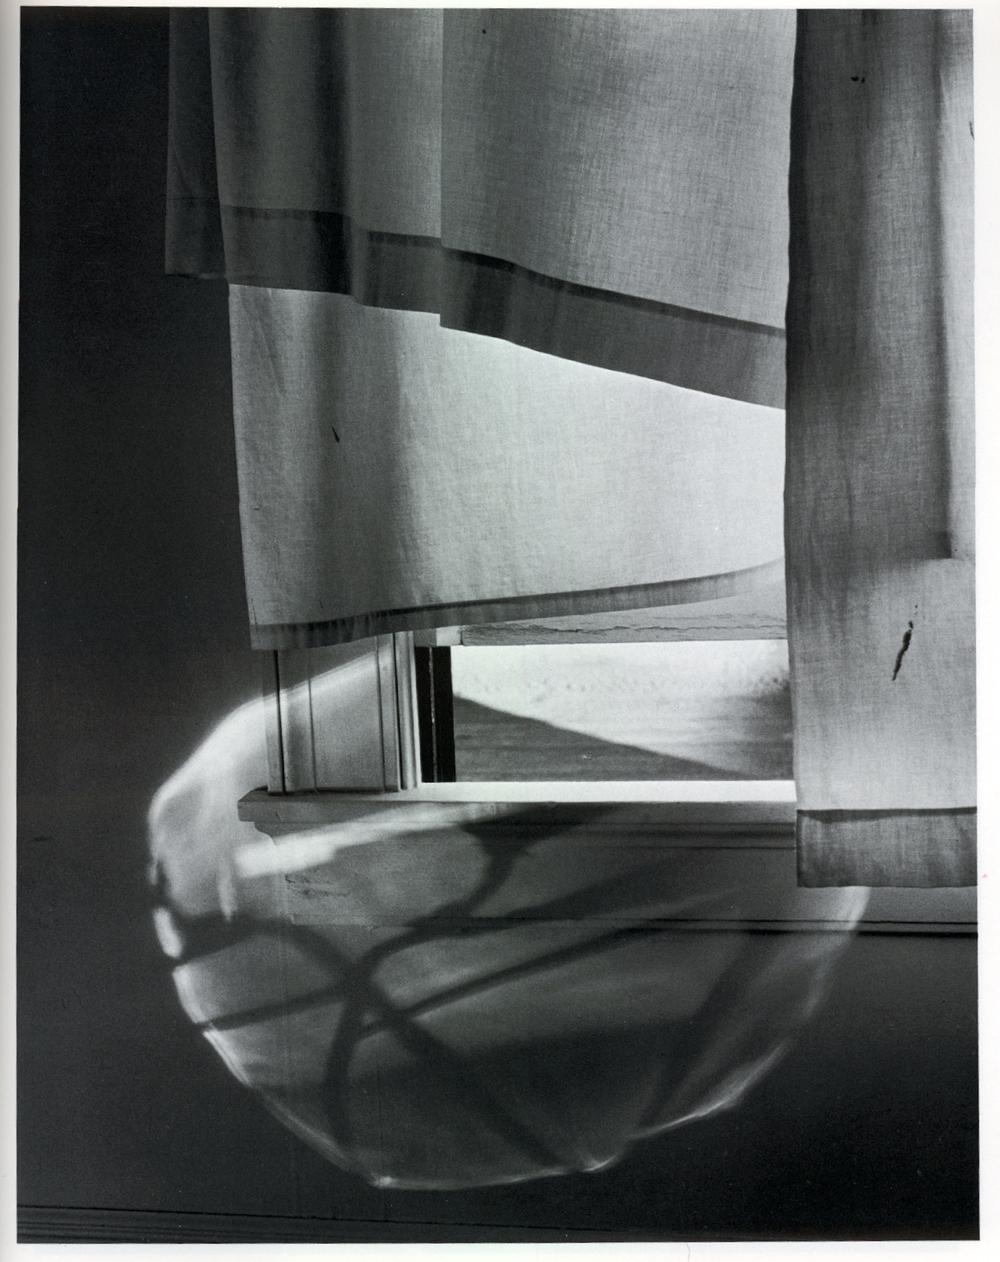 Windowsill daydreaming